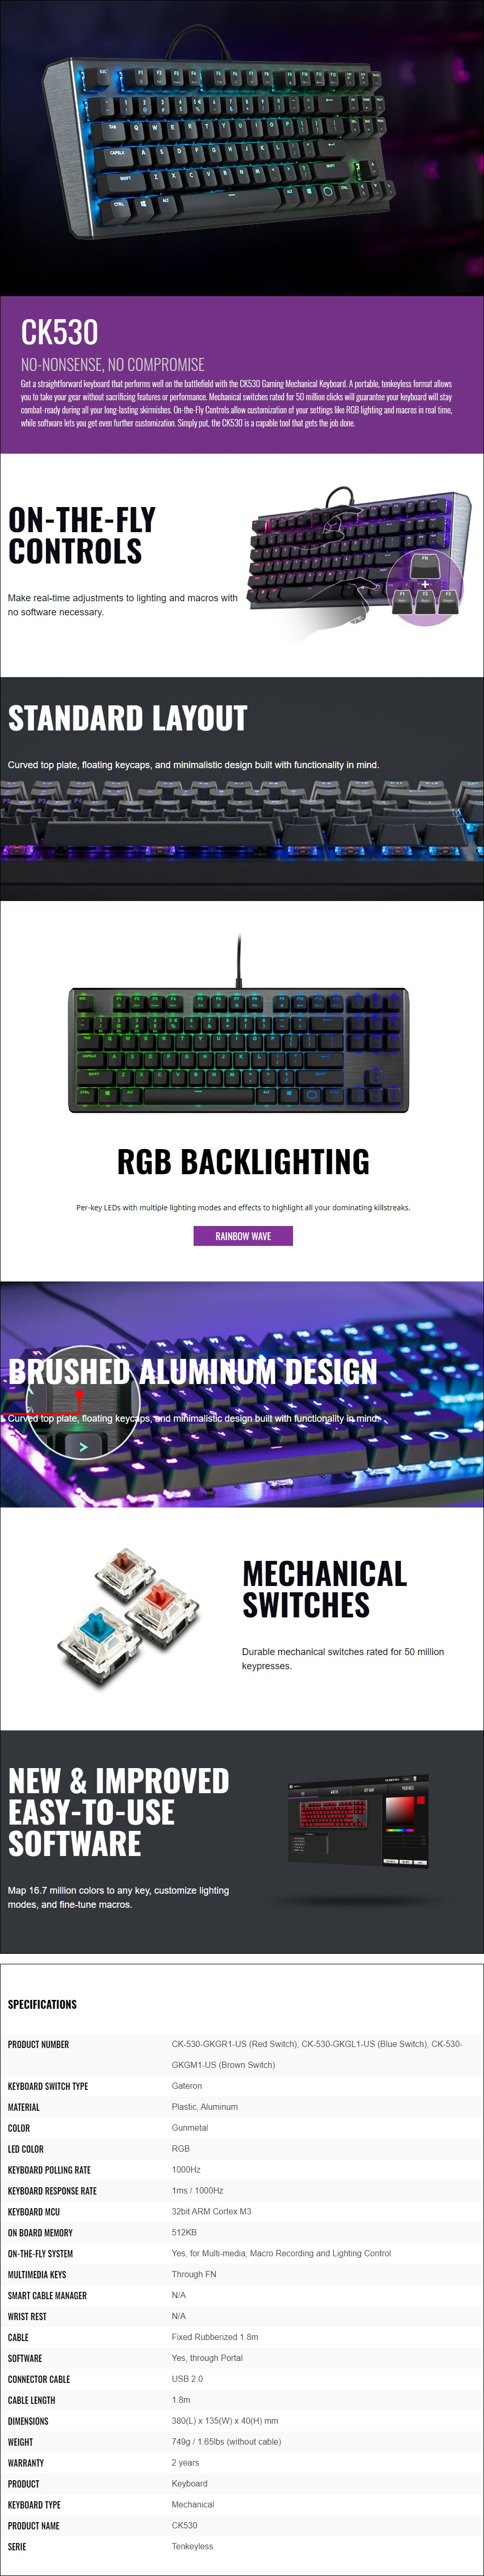 Cooler Master CK530 RGB TKL Mechanical Gaming Keyboard - Gateron Blue - Overview 1